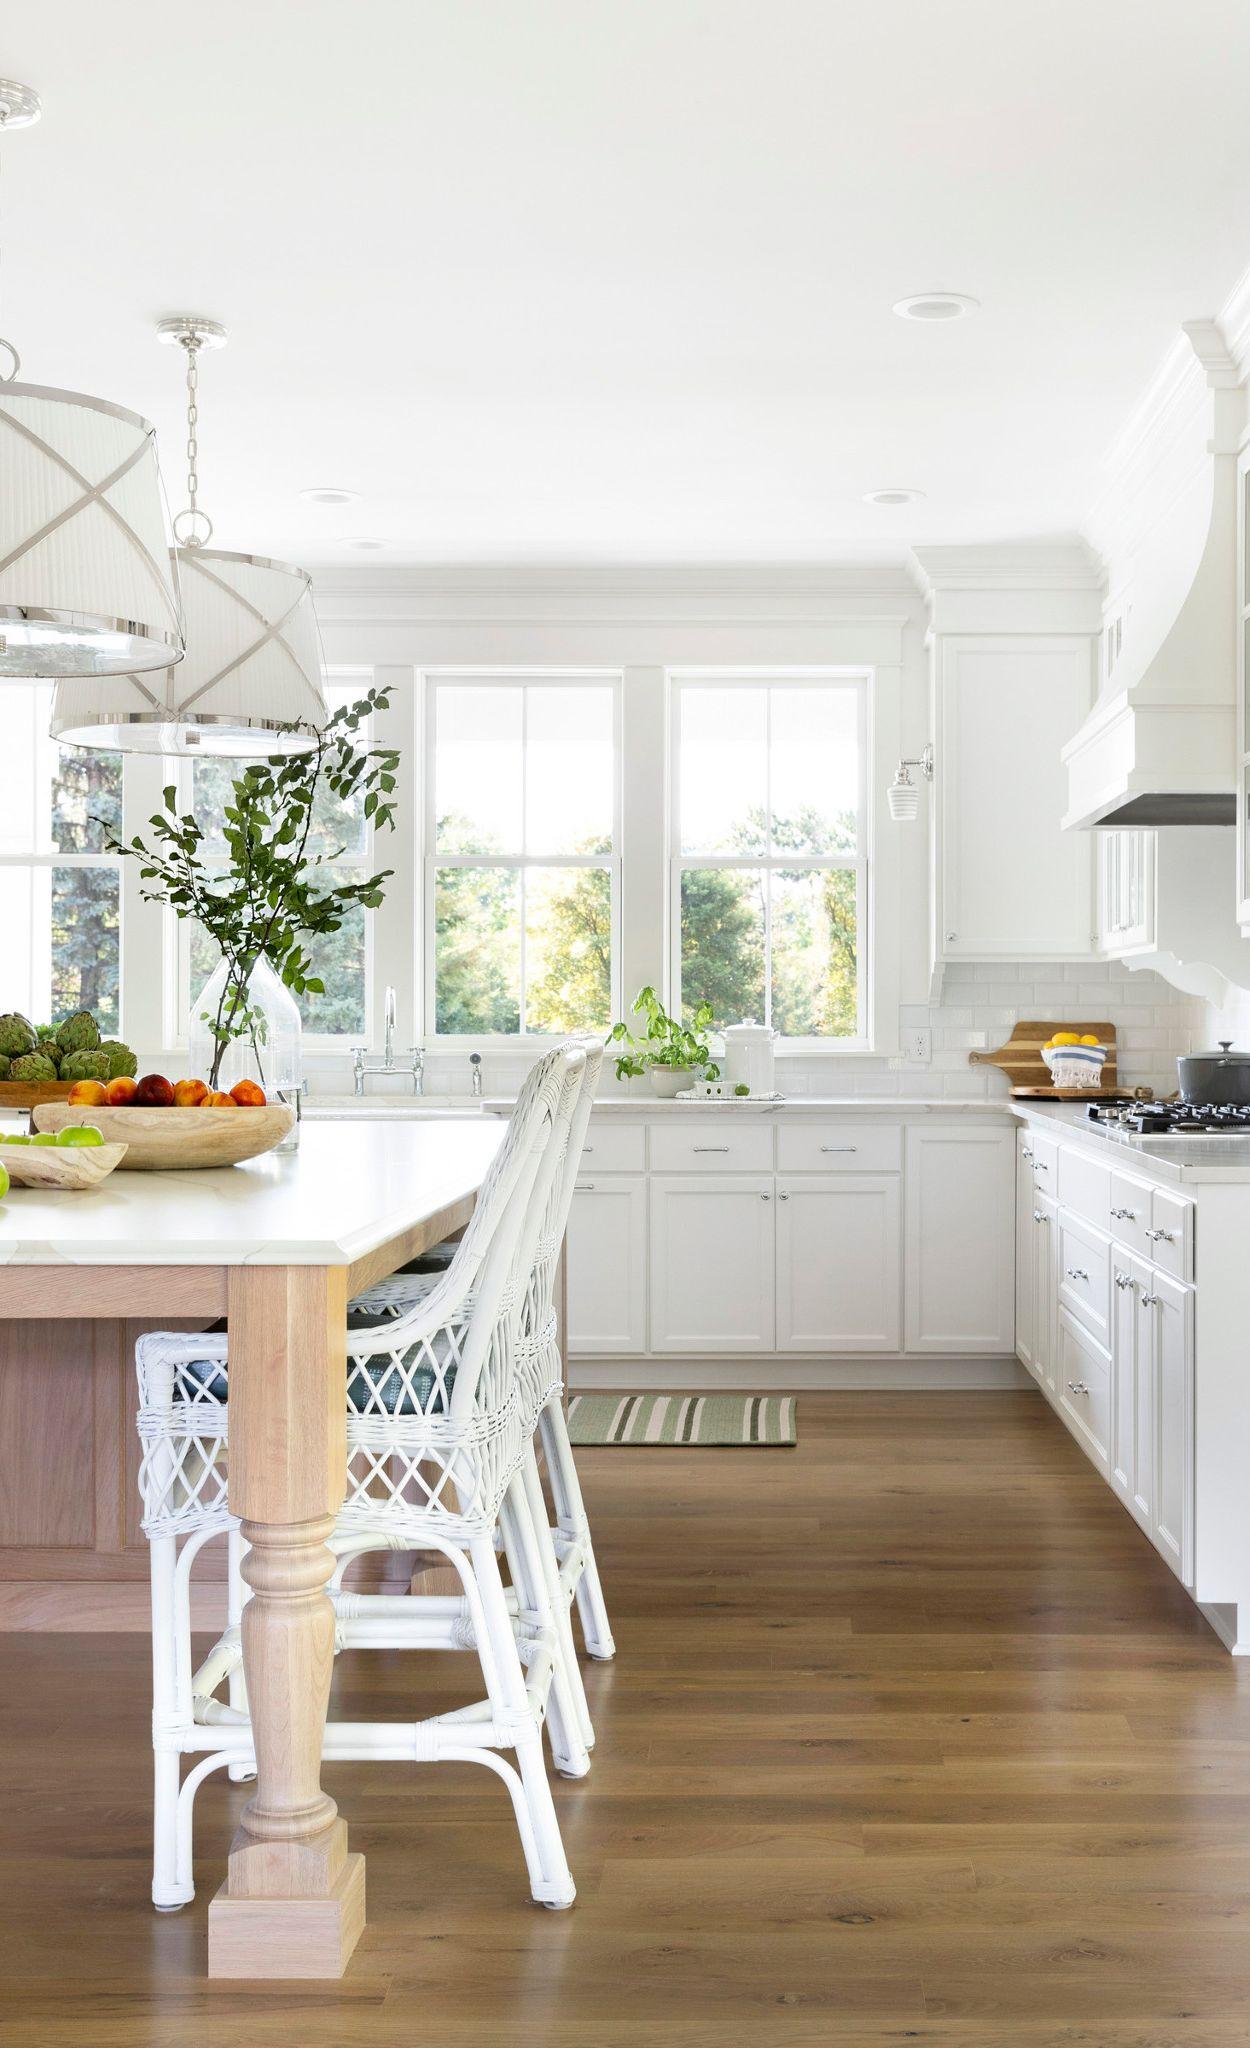 A large Brittanicca Warm island creates stylish and functional kitchen.